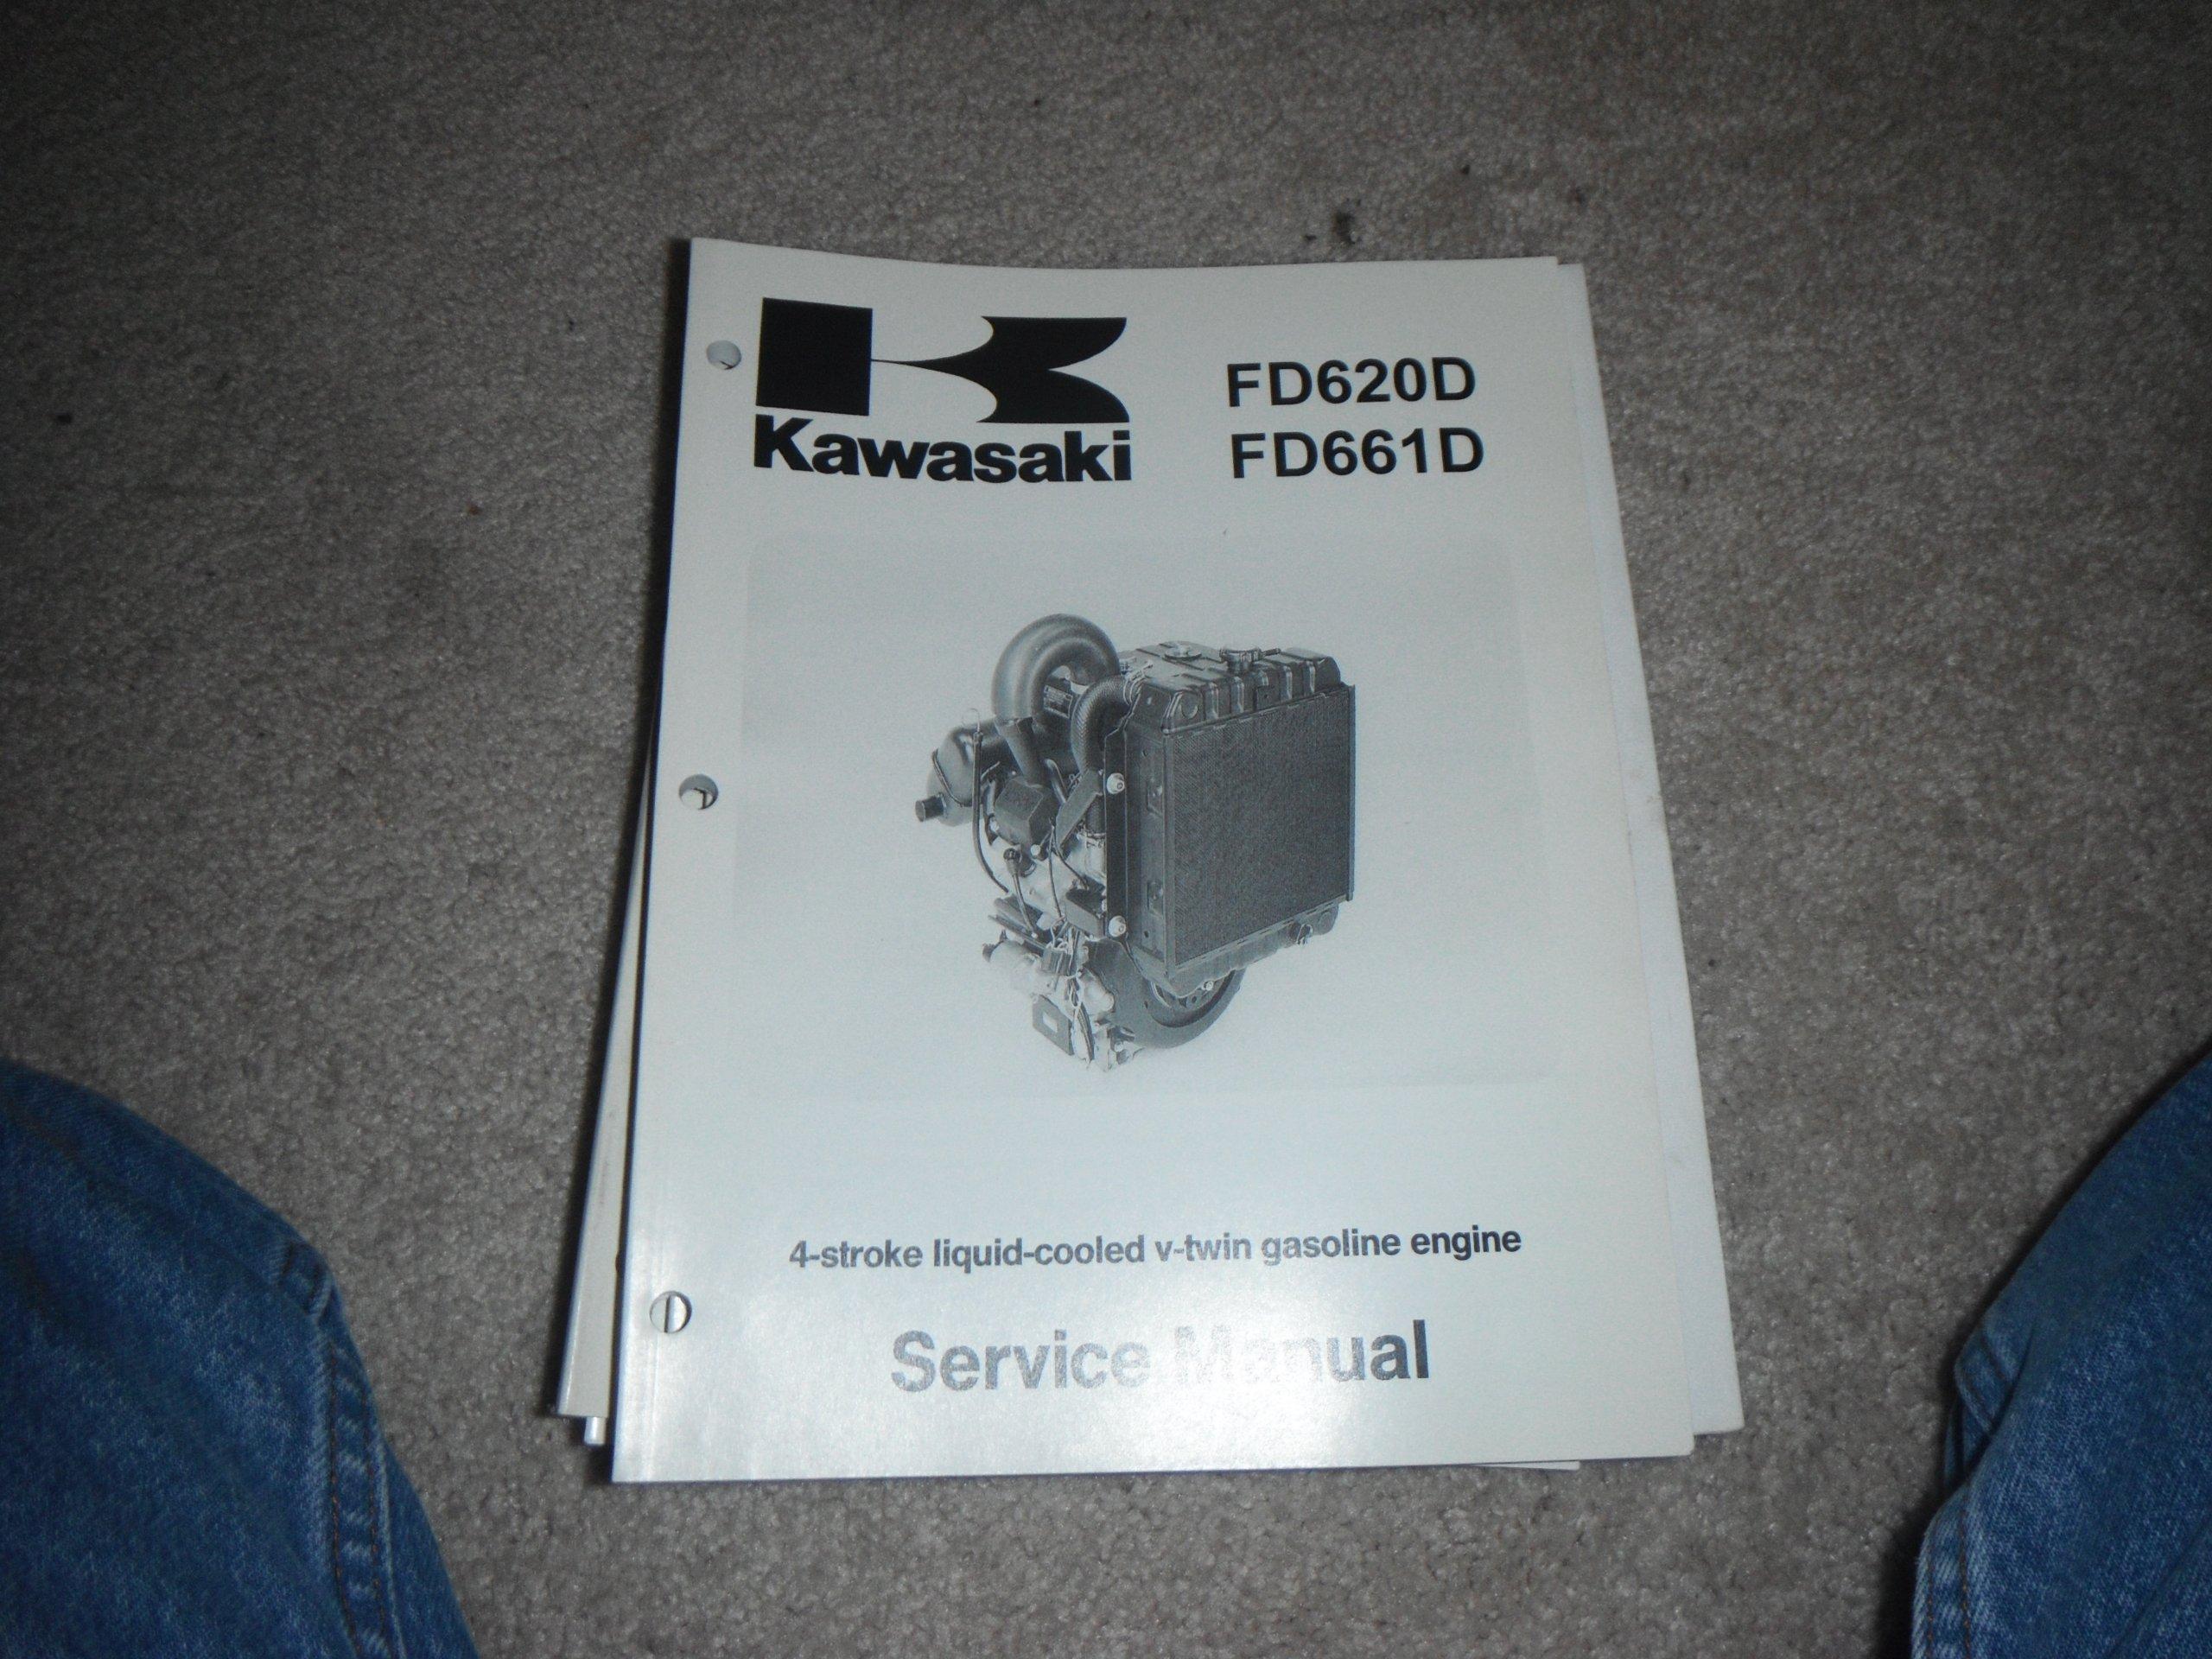 kawasaki FD620D, FD661D- 4 Stroke Liquid Cooled V-twin Gasoline Engine  Service Manual: kawasaki heavy industries: Amazon.com: Books